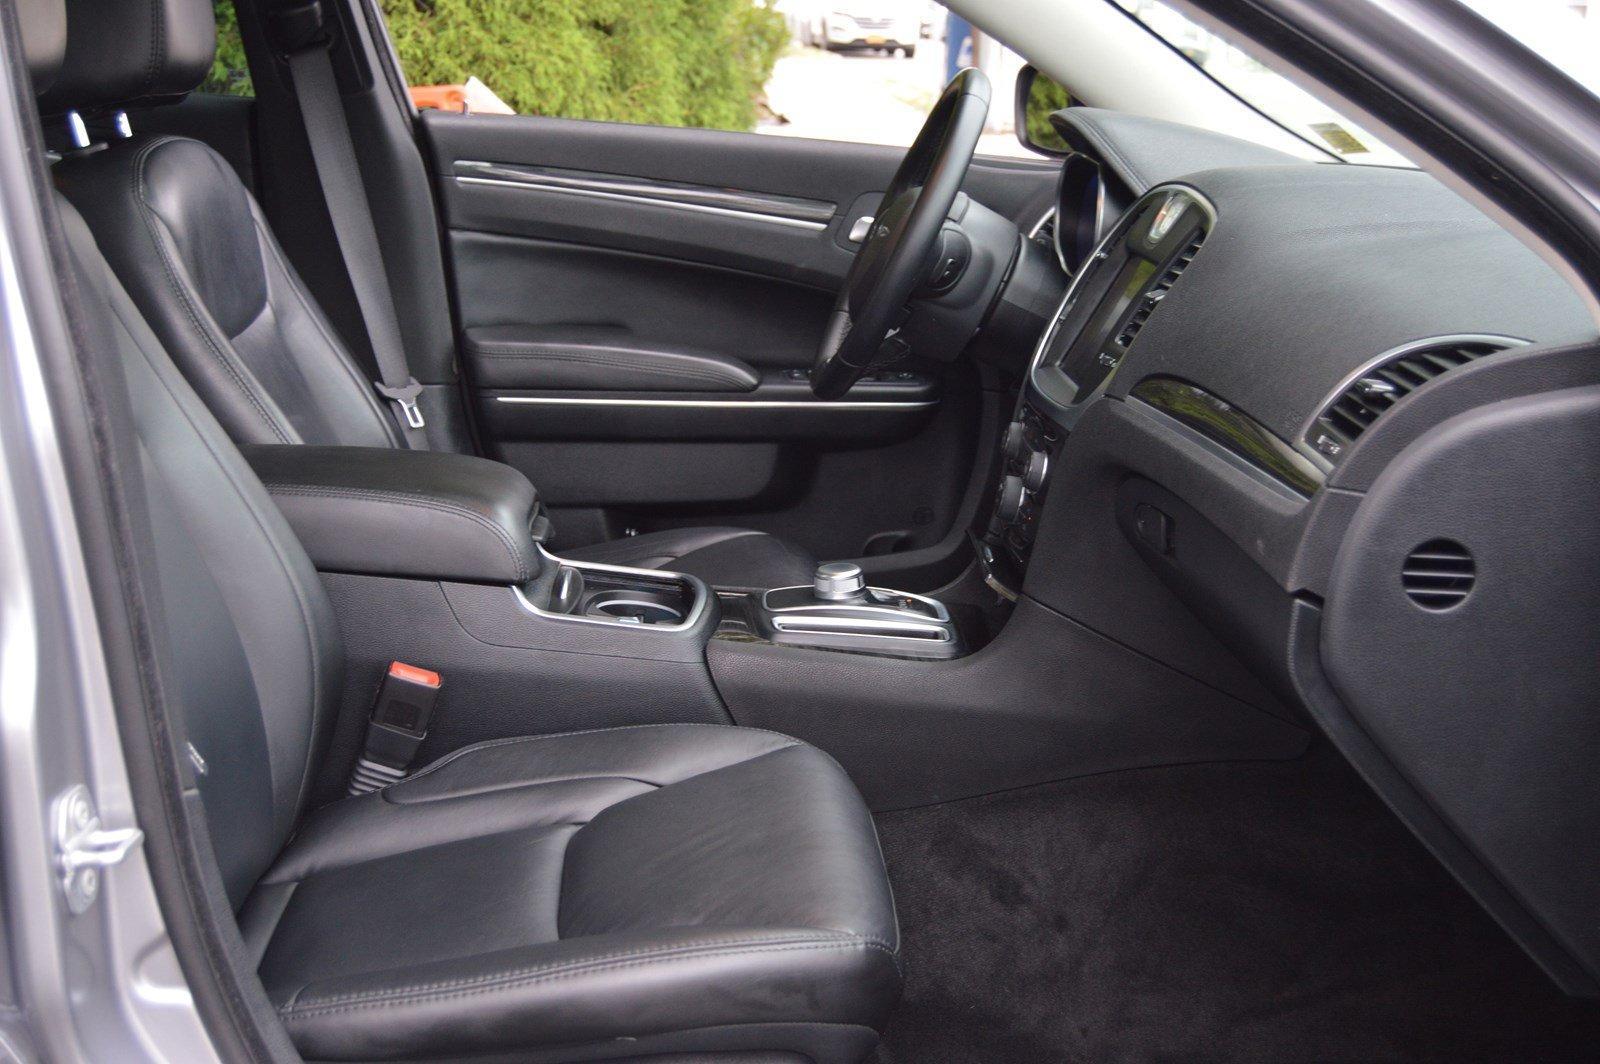 Used-2016-Chrysler-300-Anniversary-Edition